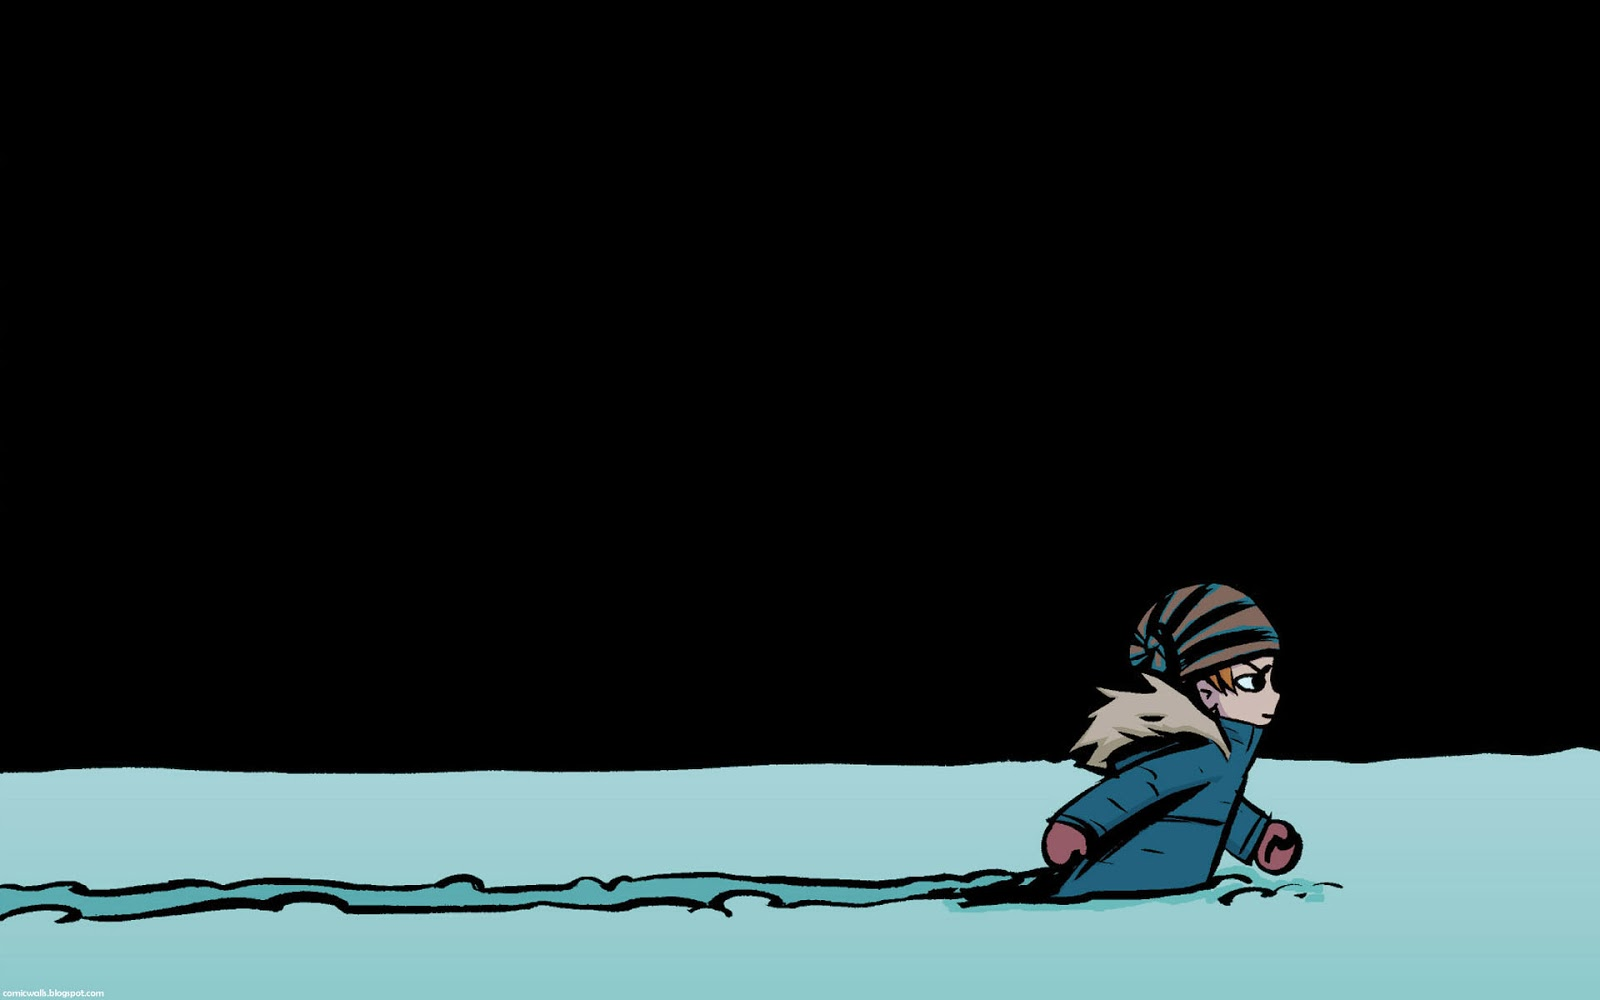 Scott Pilgrim Iphone Wallpaper: Scott Pilgrim (Comic Wallpaper